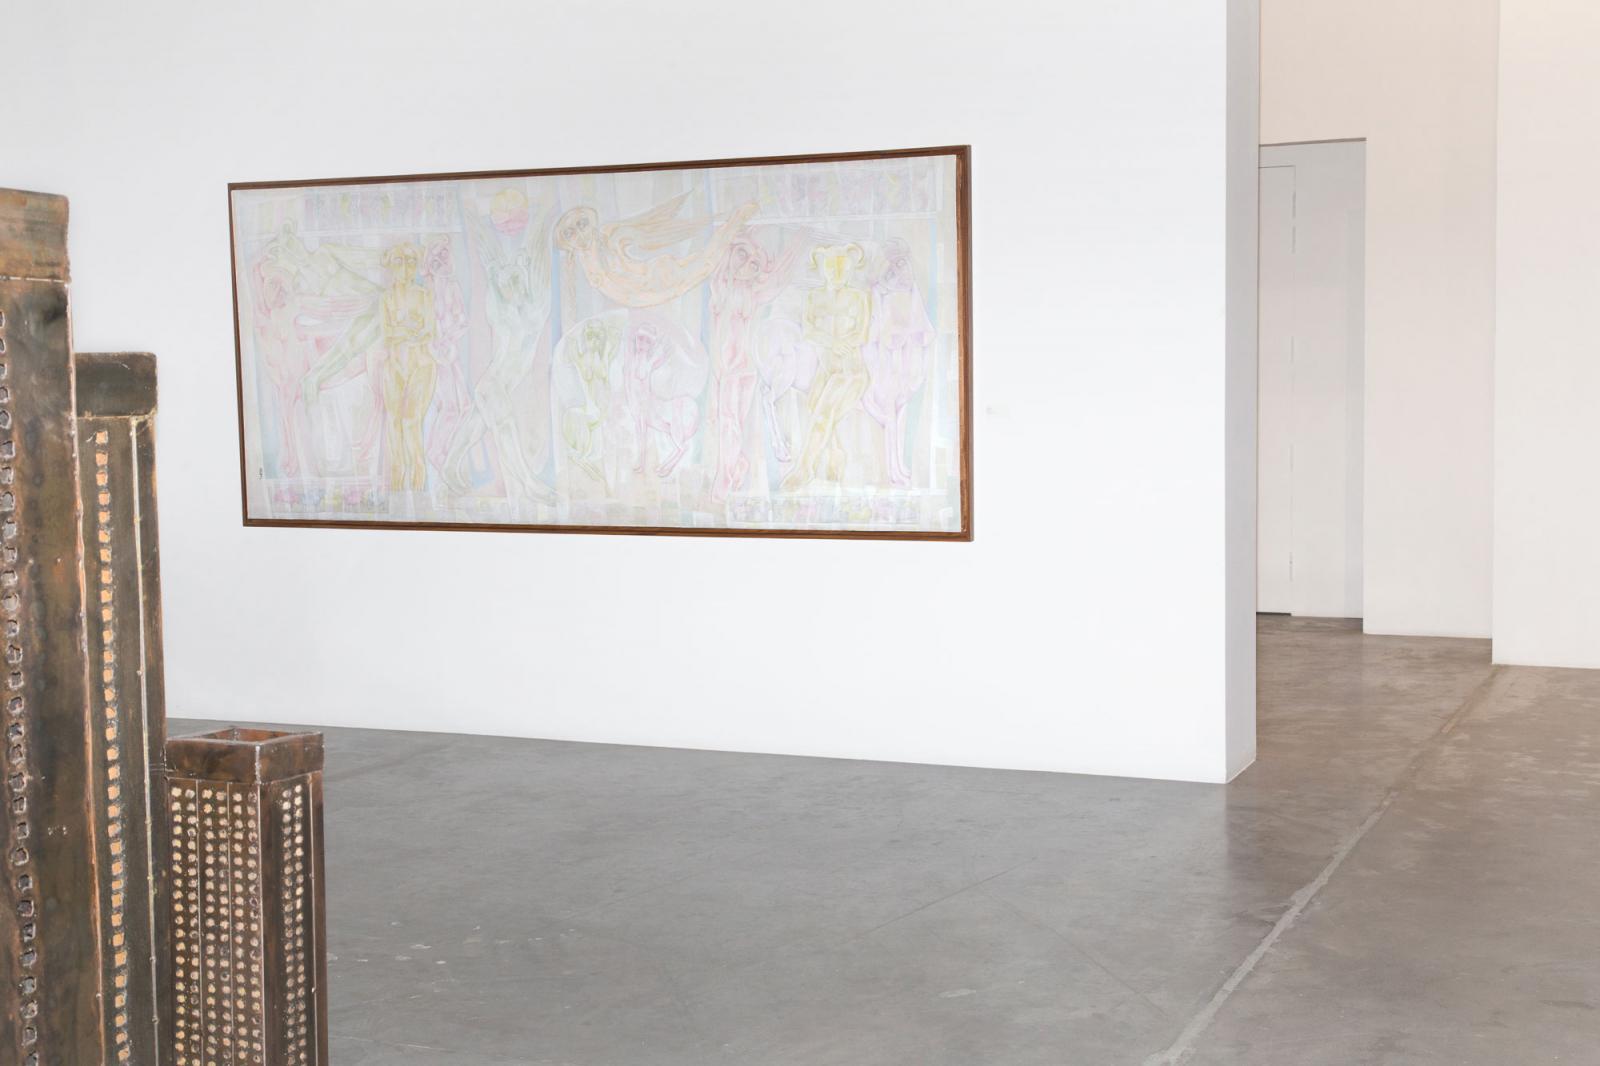 Ayyam Gallery Front: /BurjelMurr/byGinane Makki Bacho Back: /Untitled /byLeila Nseir